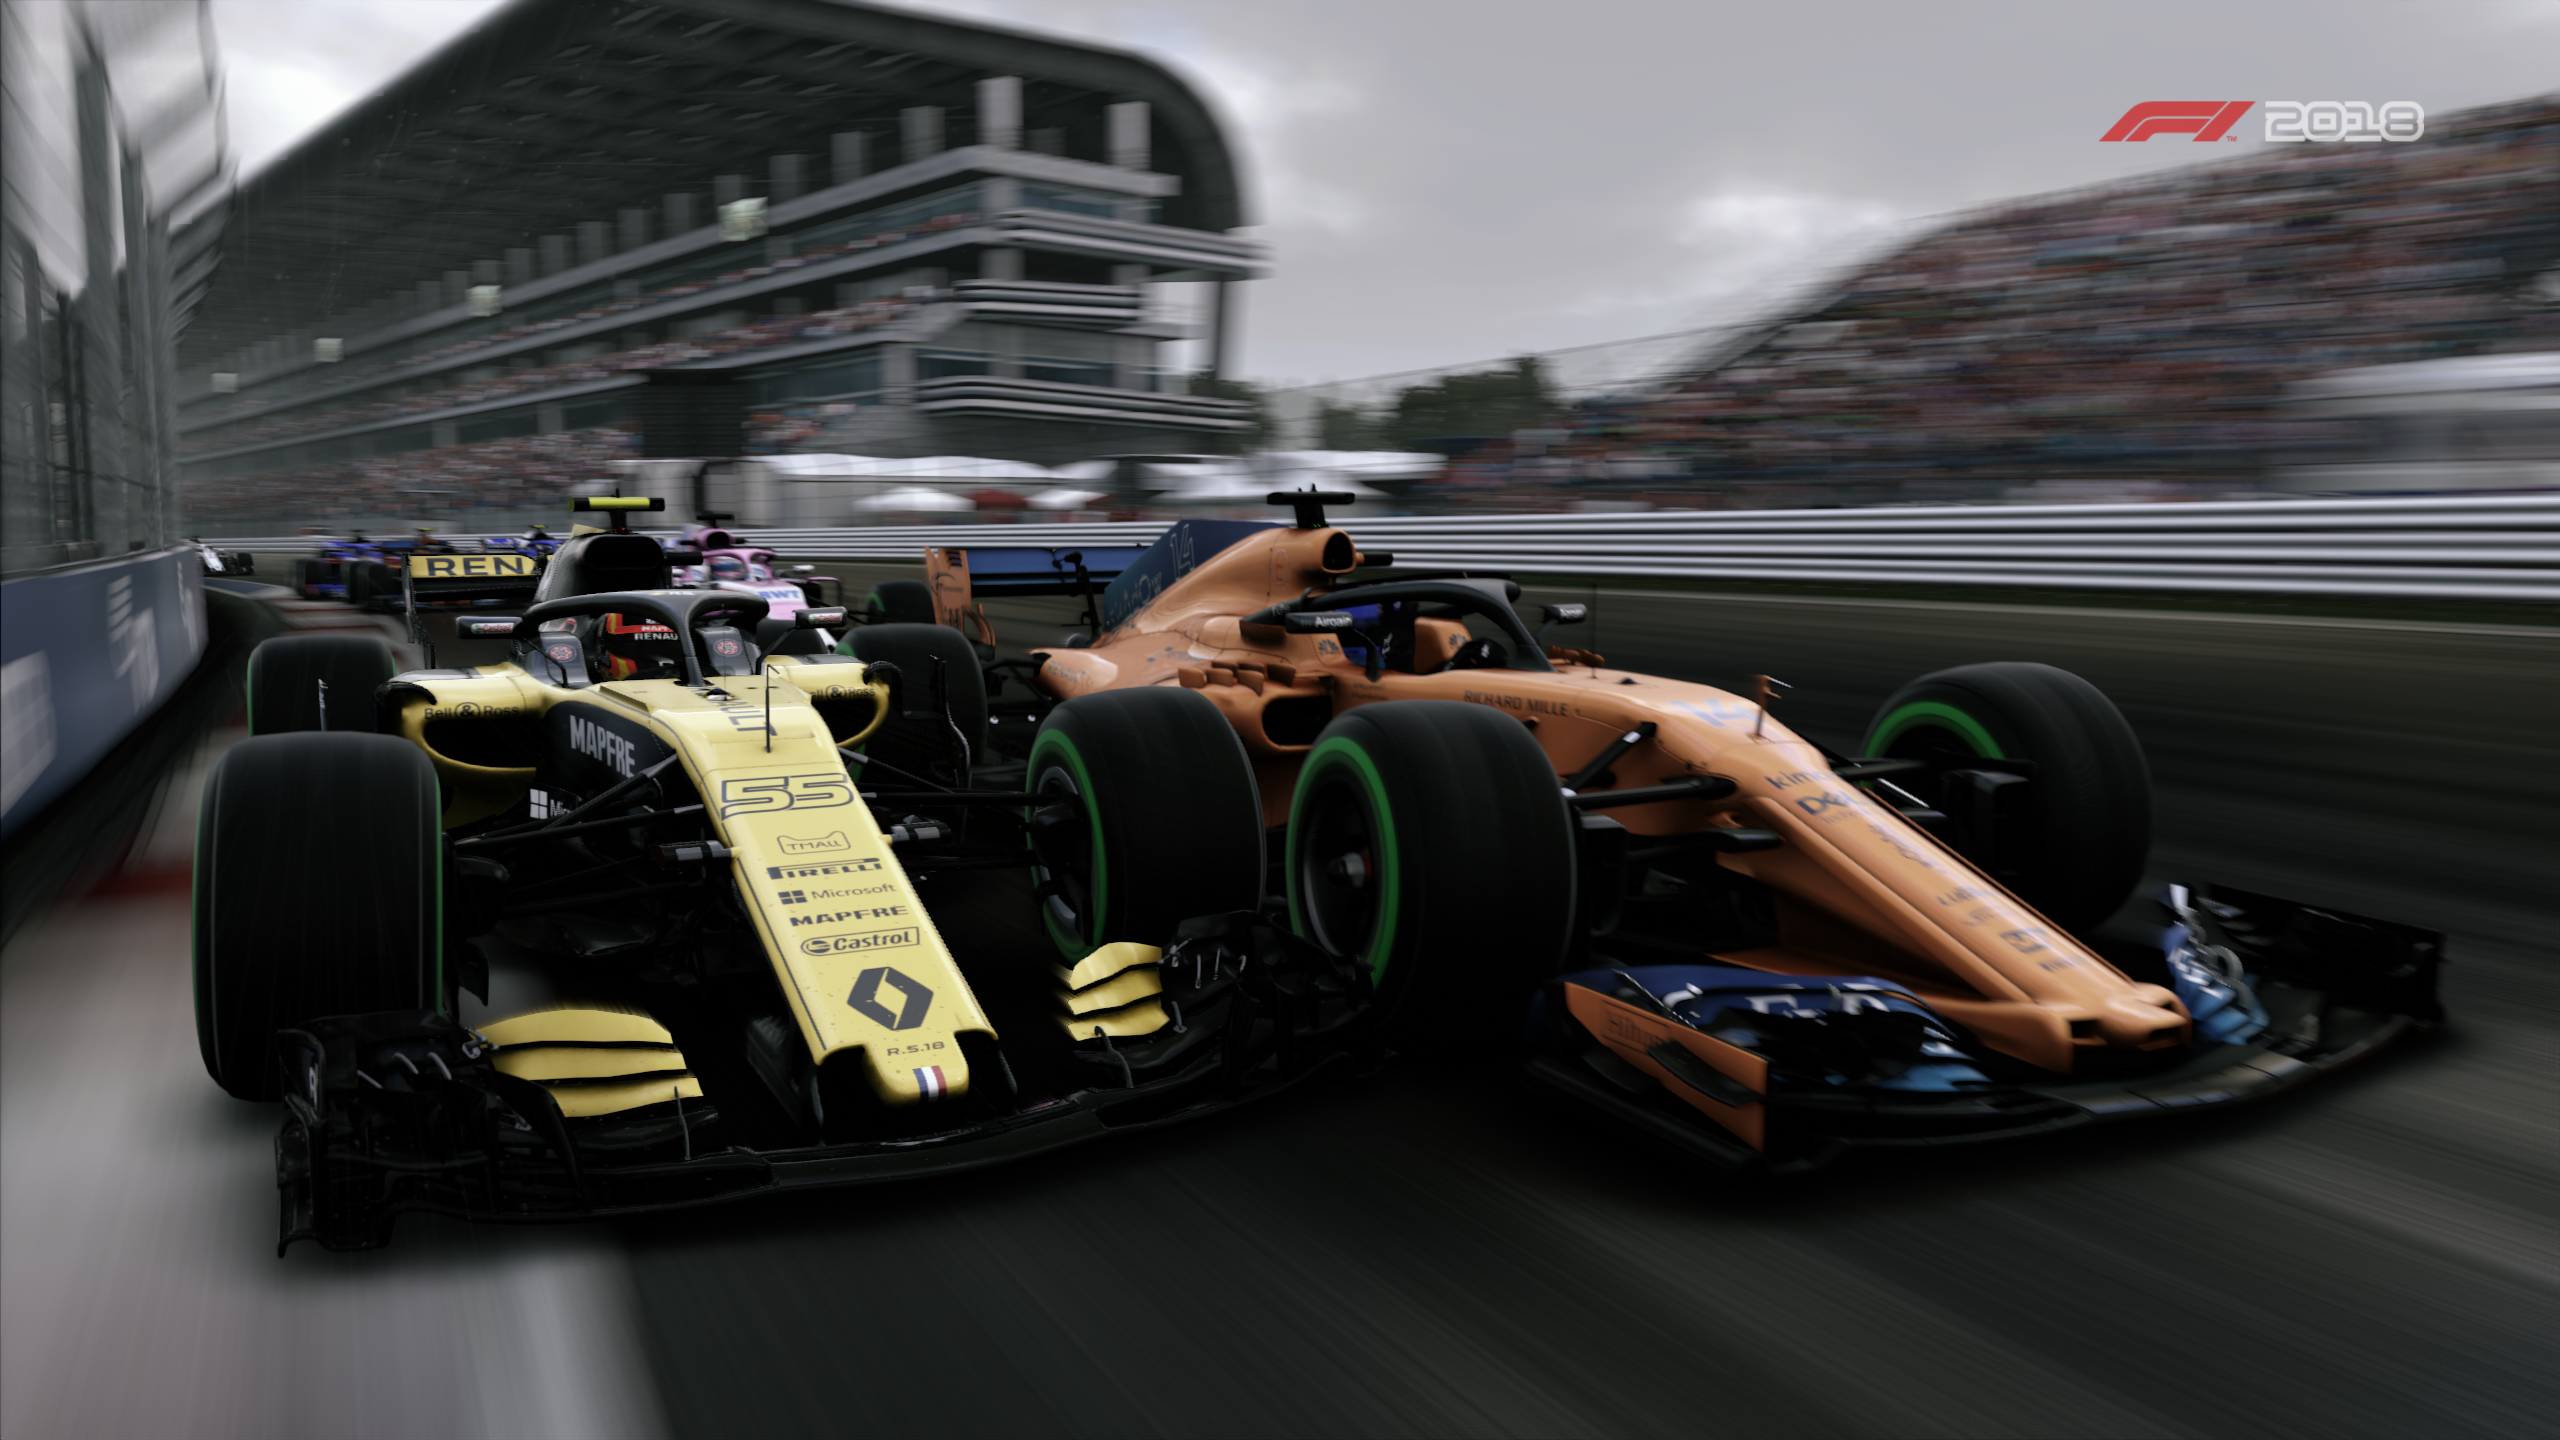 F1 2018 Formula 1 Mclaren Mclaren Mcl33 Renault Renault Rs18 Vehicle 2560x1440